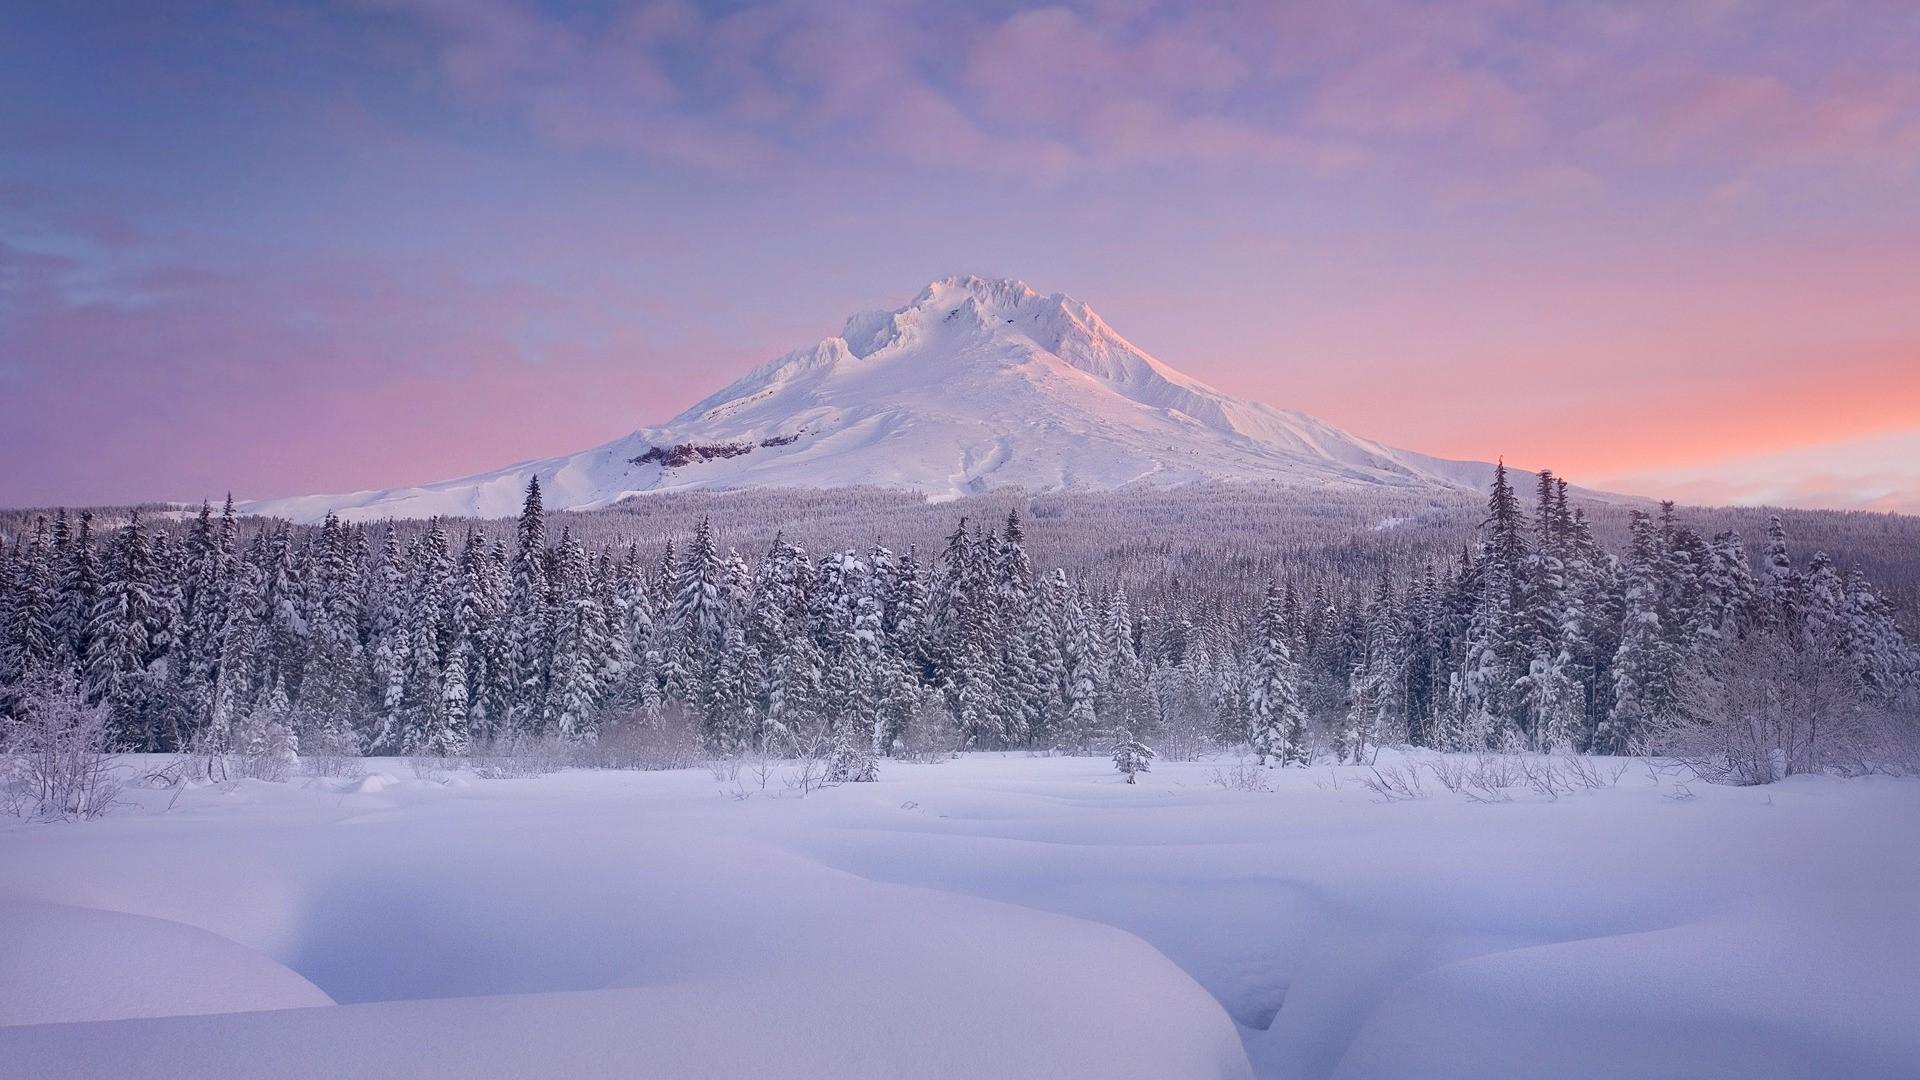 HD Nature - Landscape Wallpapers